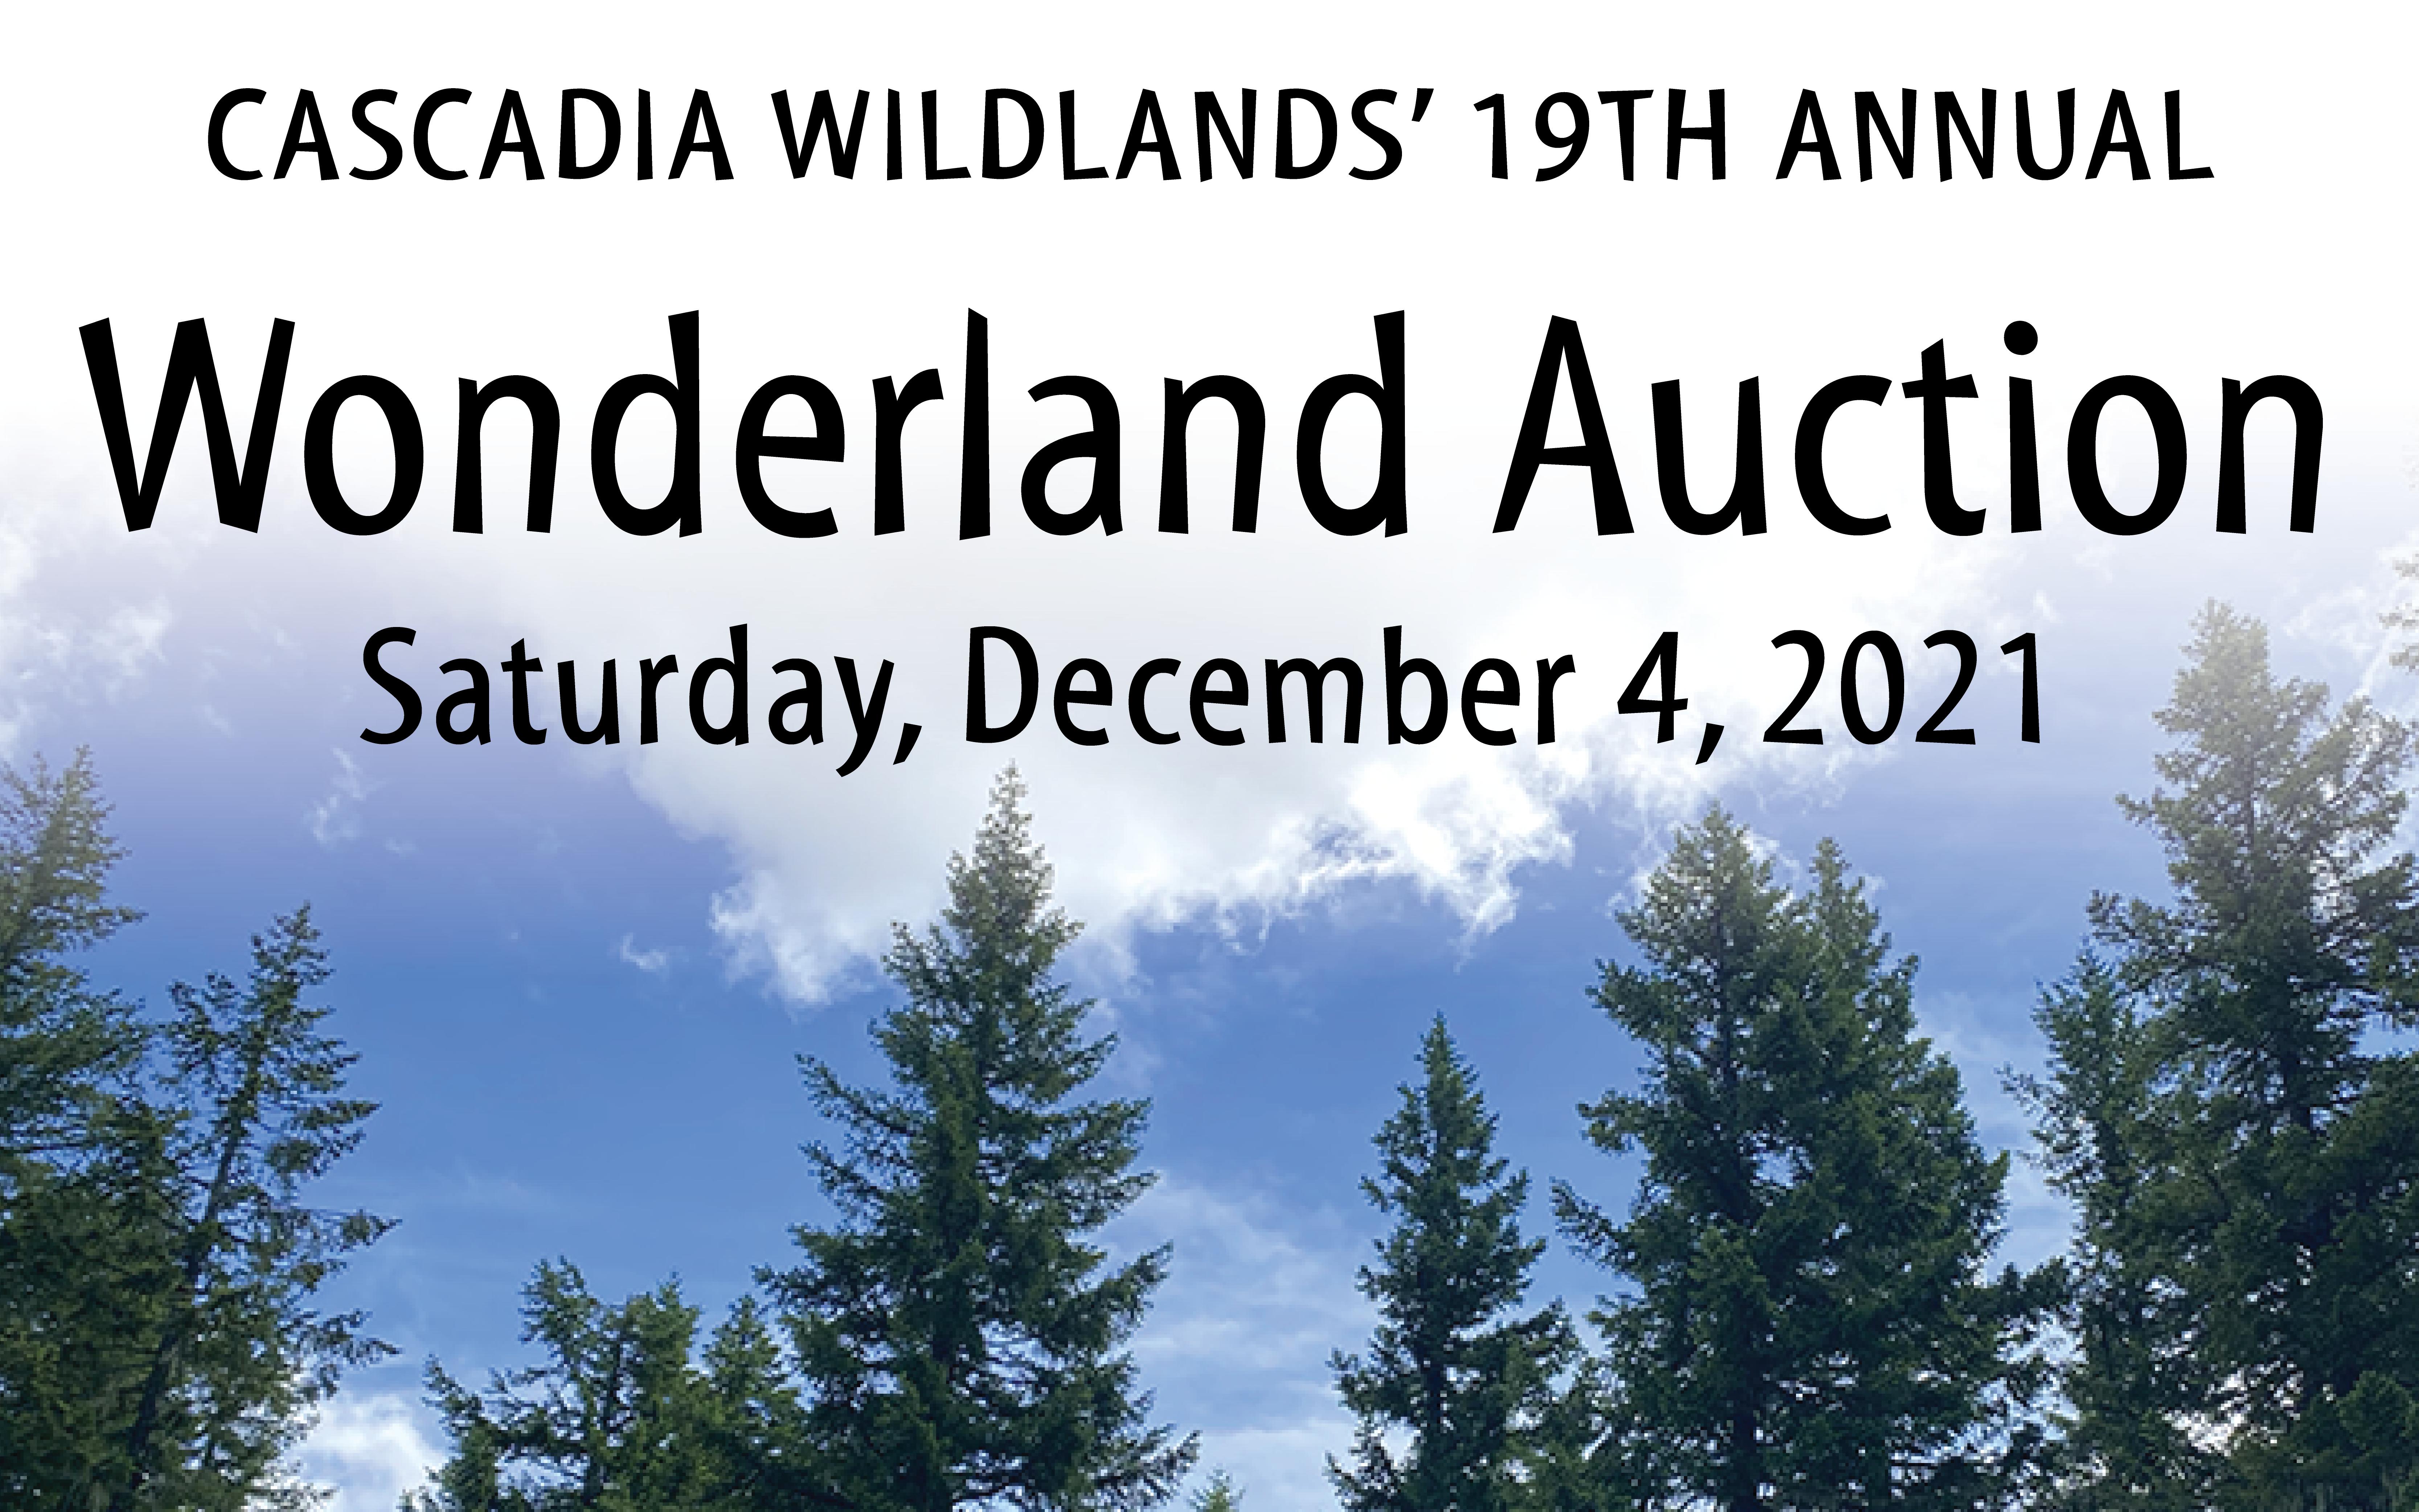 Wonderland Auction, 19th Annual